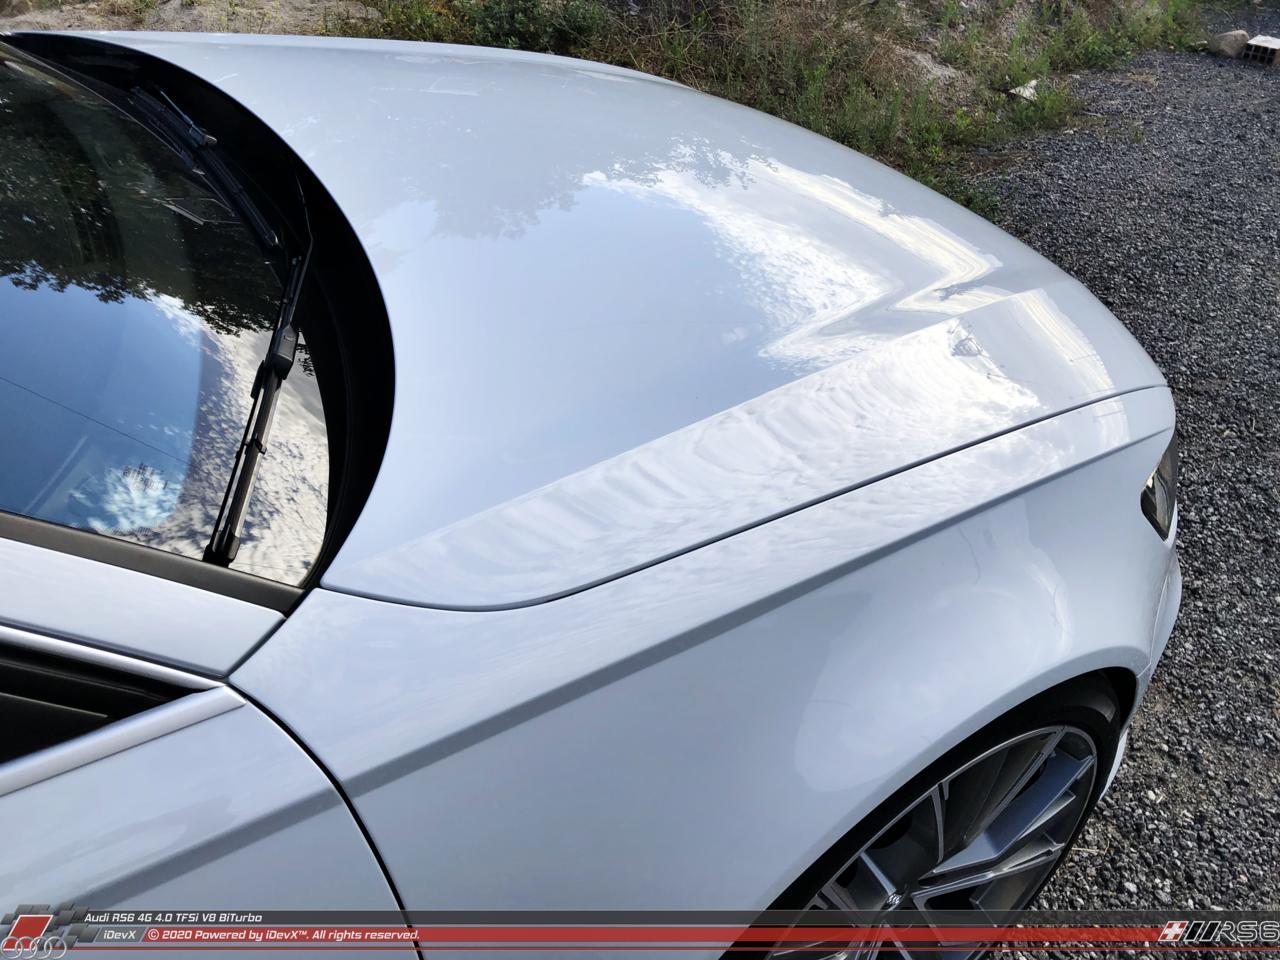 05_08.2019_Audi-RS6_iDevX_037.png